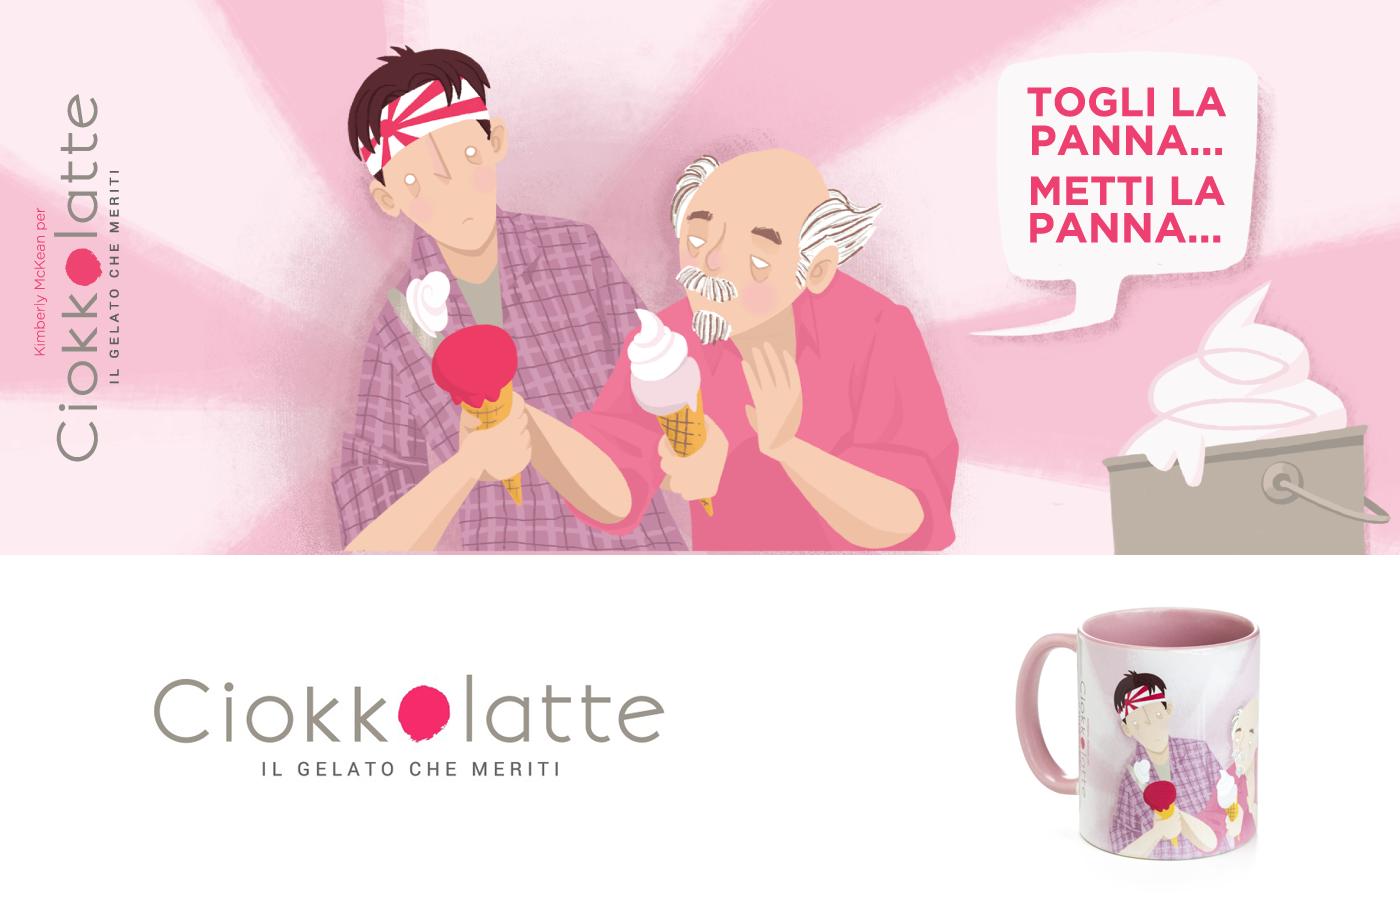 Mugs Ciokkolatte Cinema movie ice cream Gelato